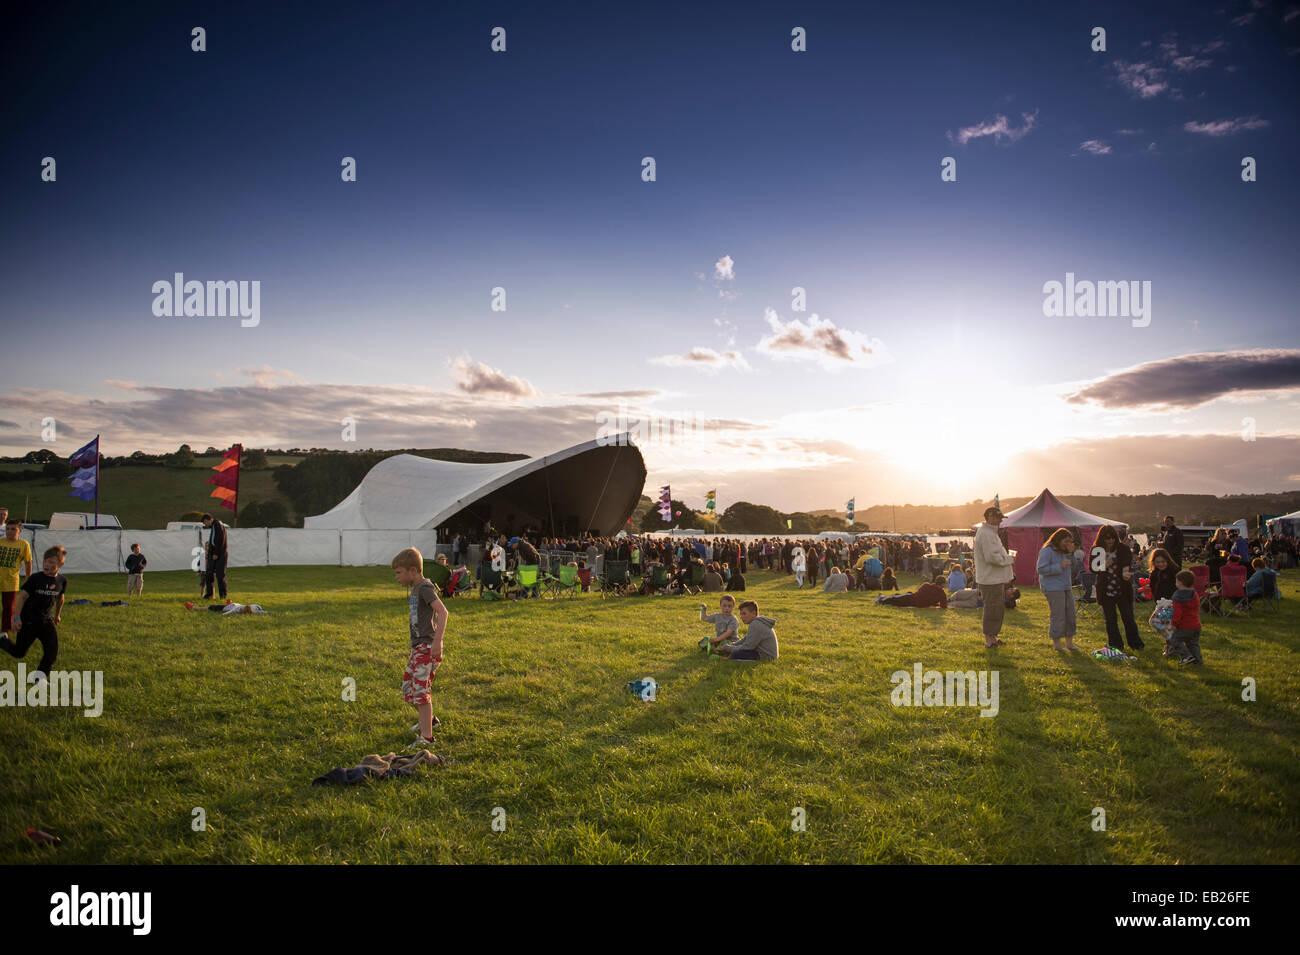 Sonnenuntergang über der großen Tribut Musikfestival Aberystwyth UK August Bank Holiday 2014 Stockbild